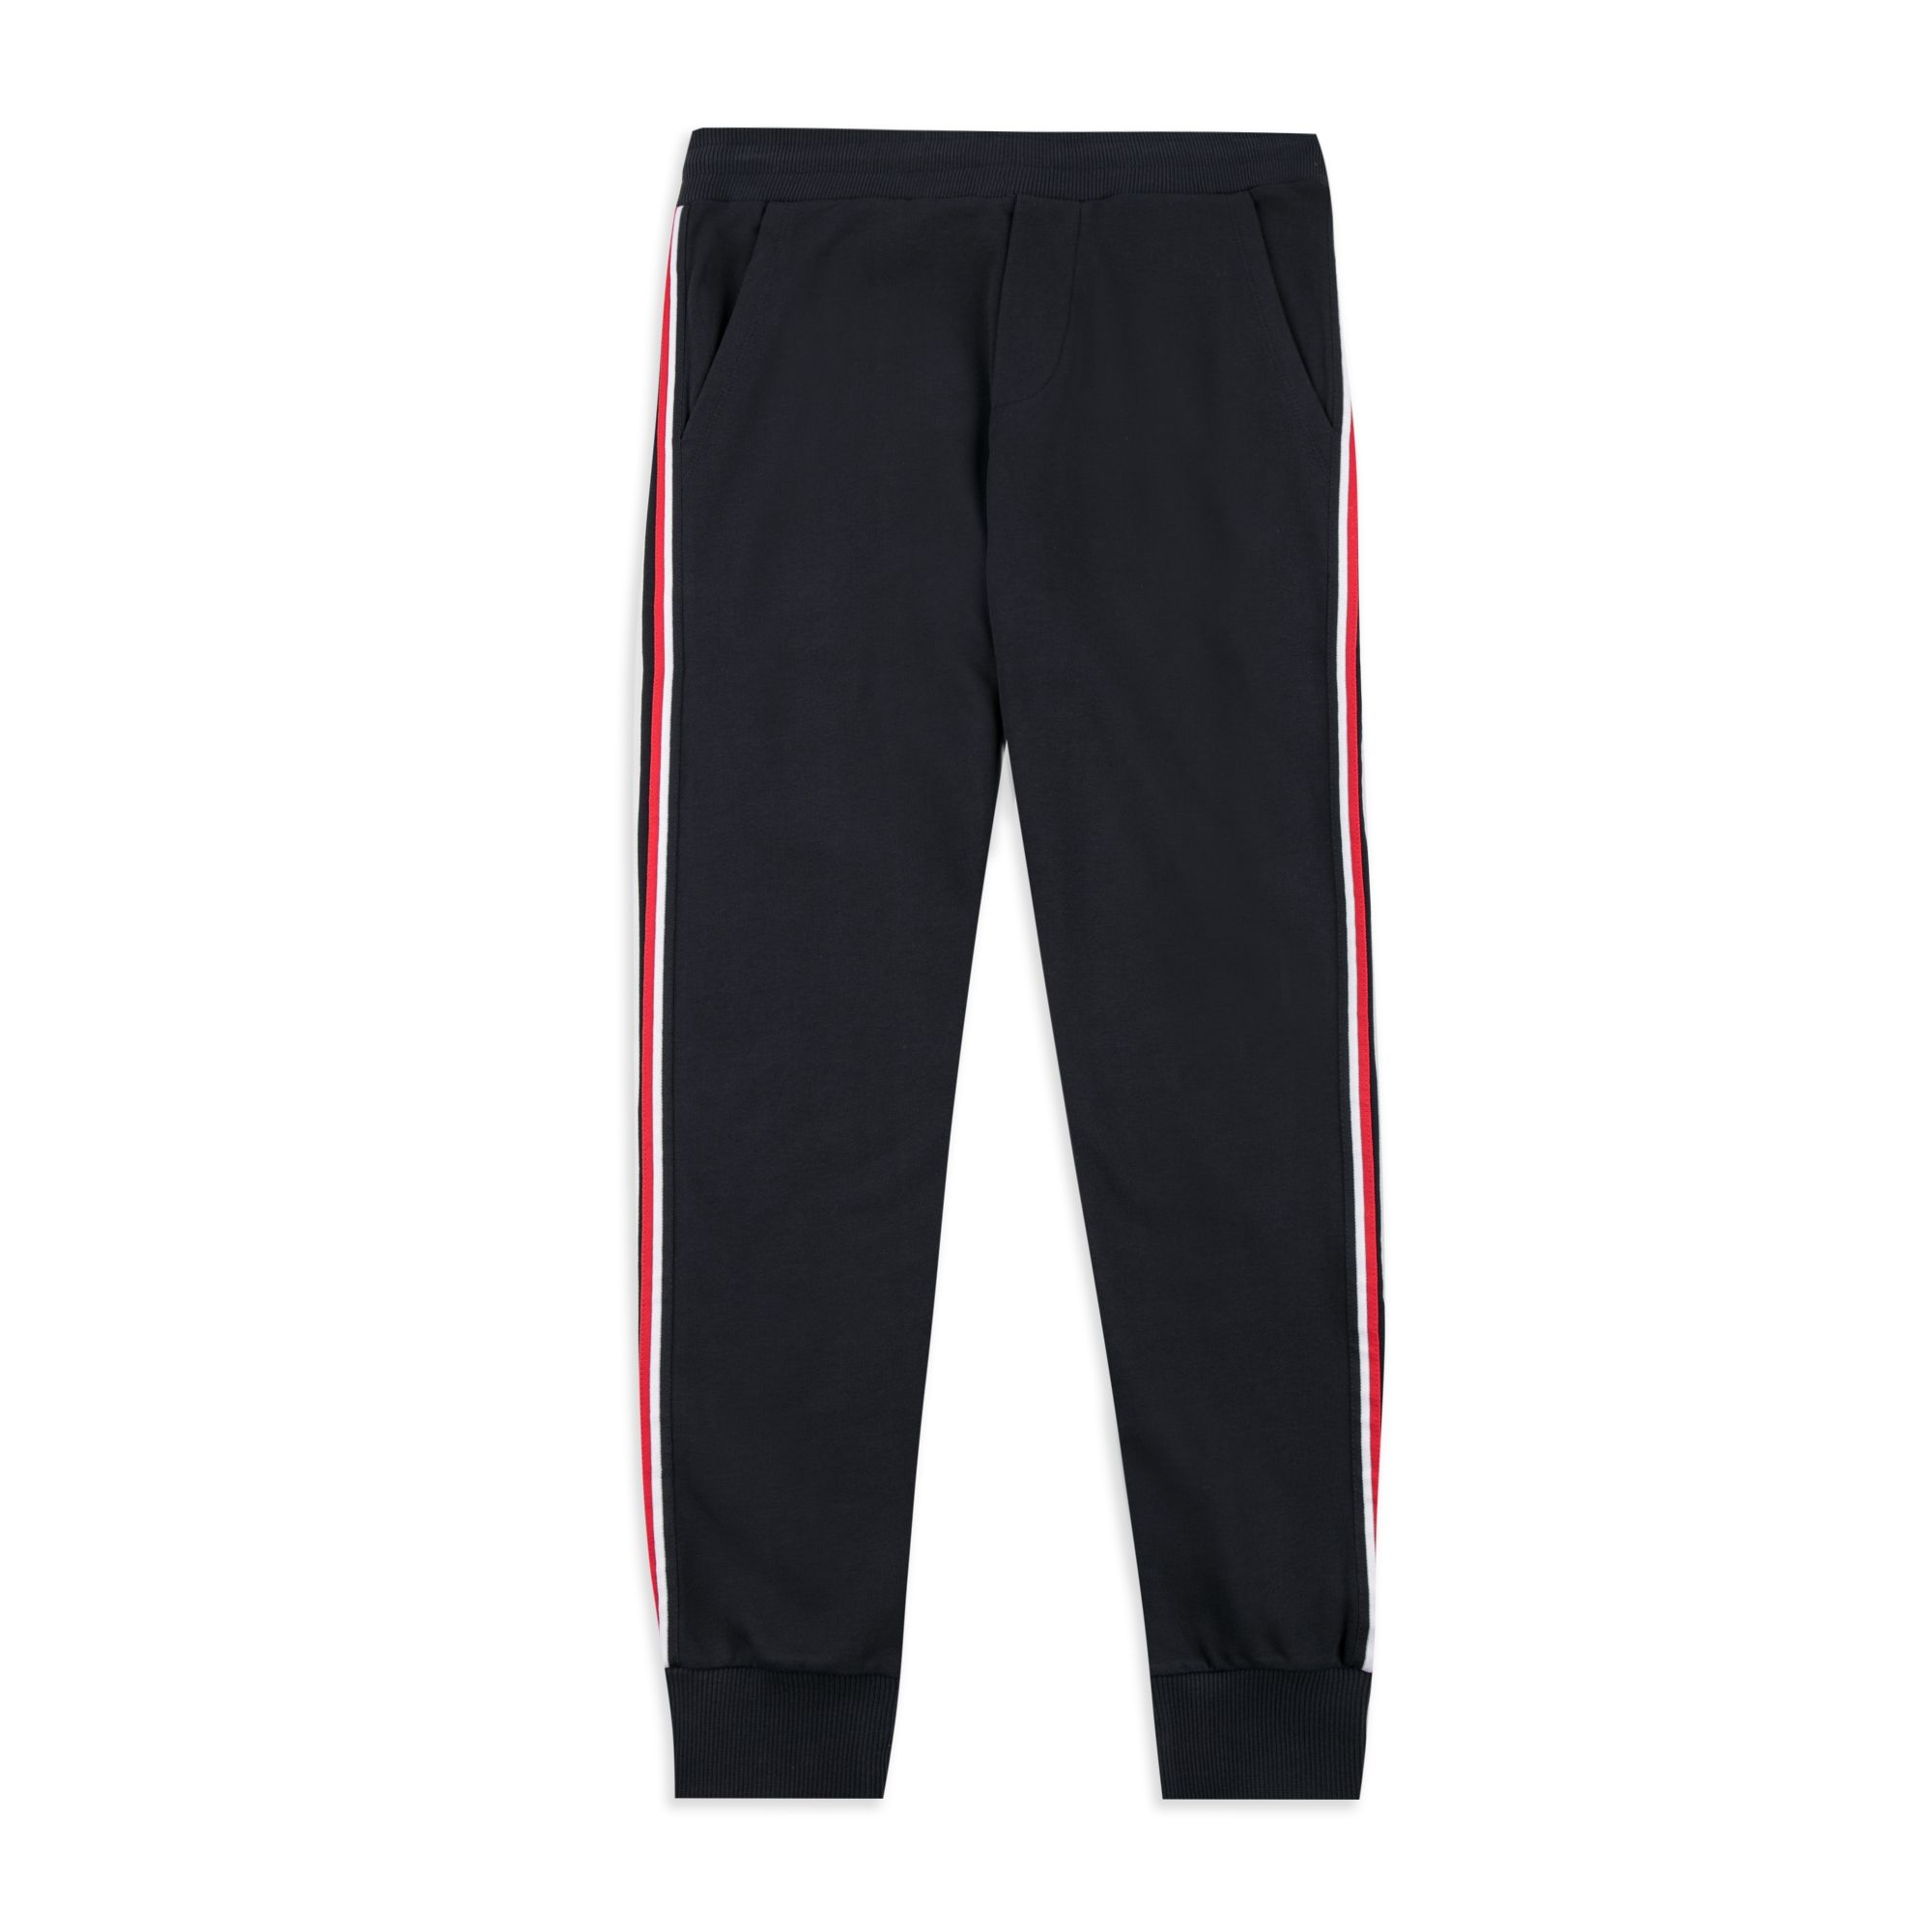 84ebd8351 Boys Striped Trim Sweatpants - Navy